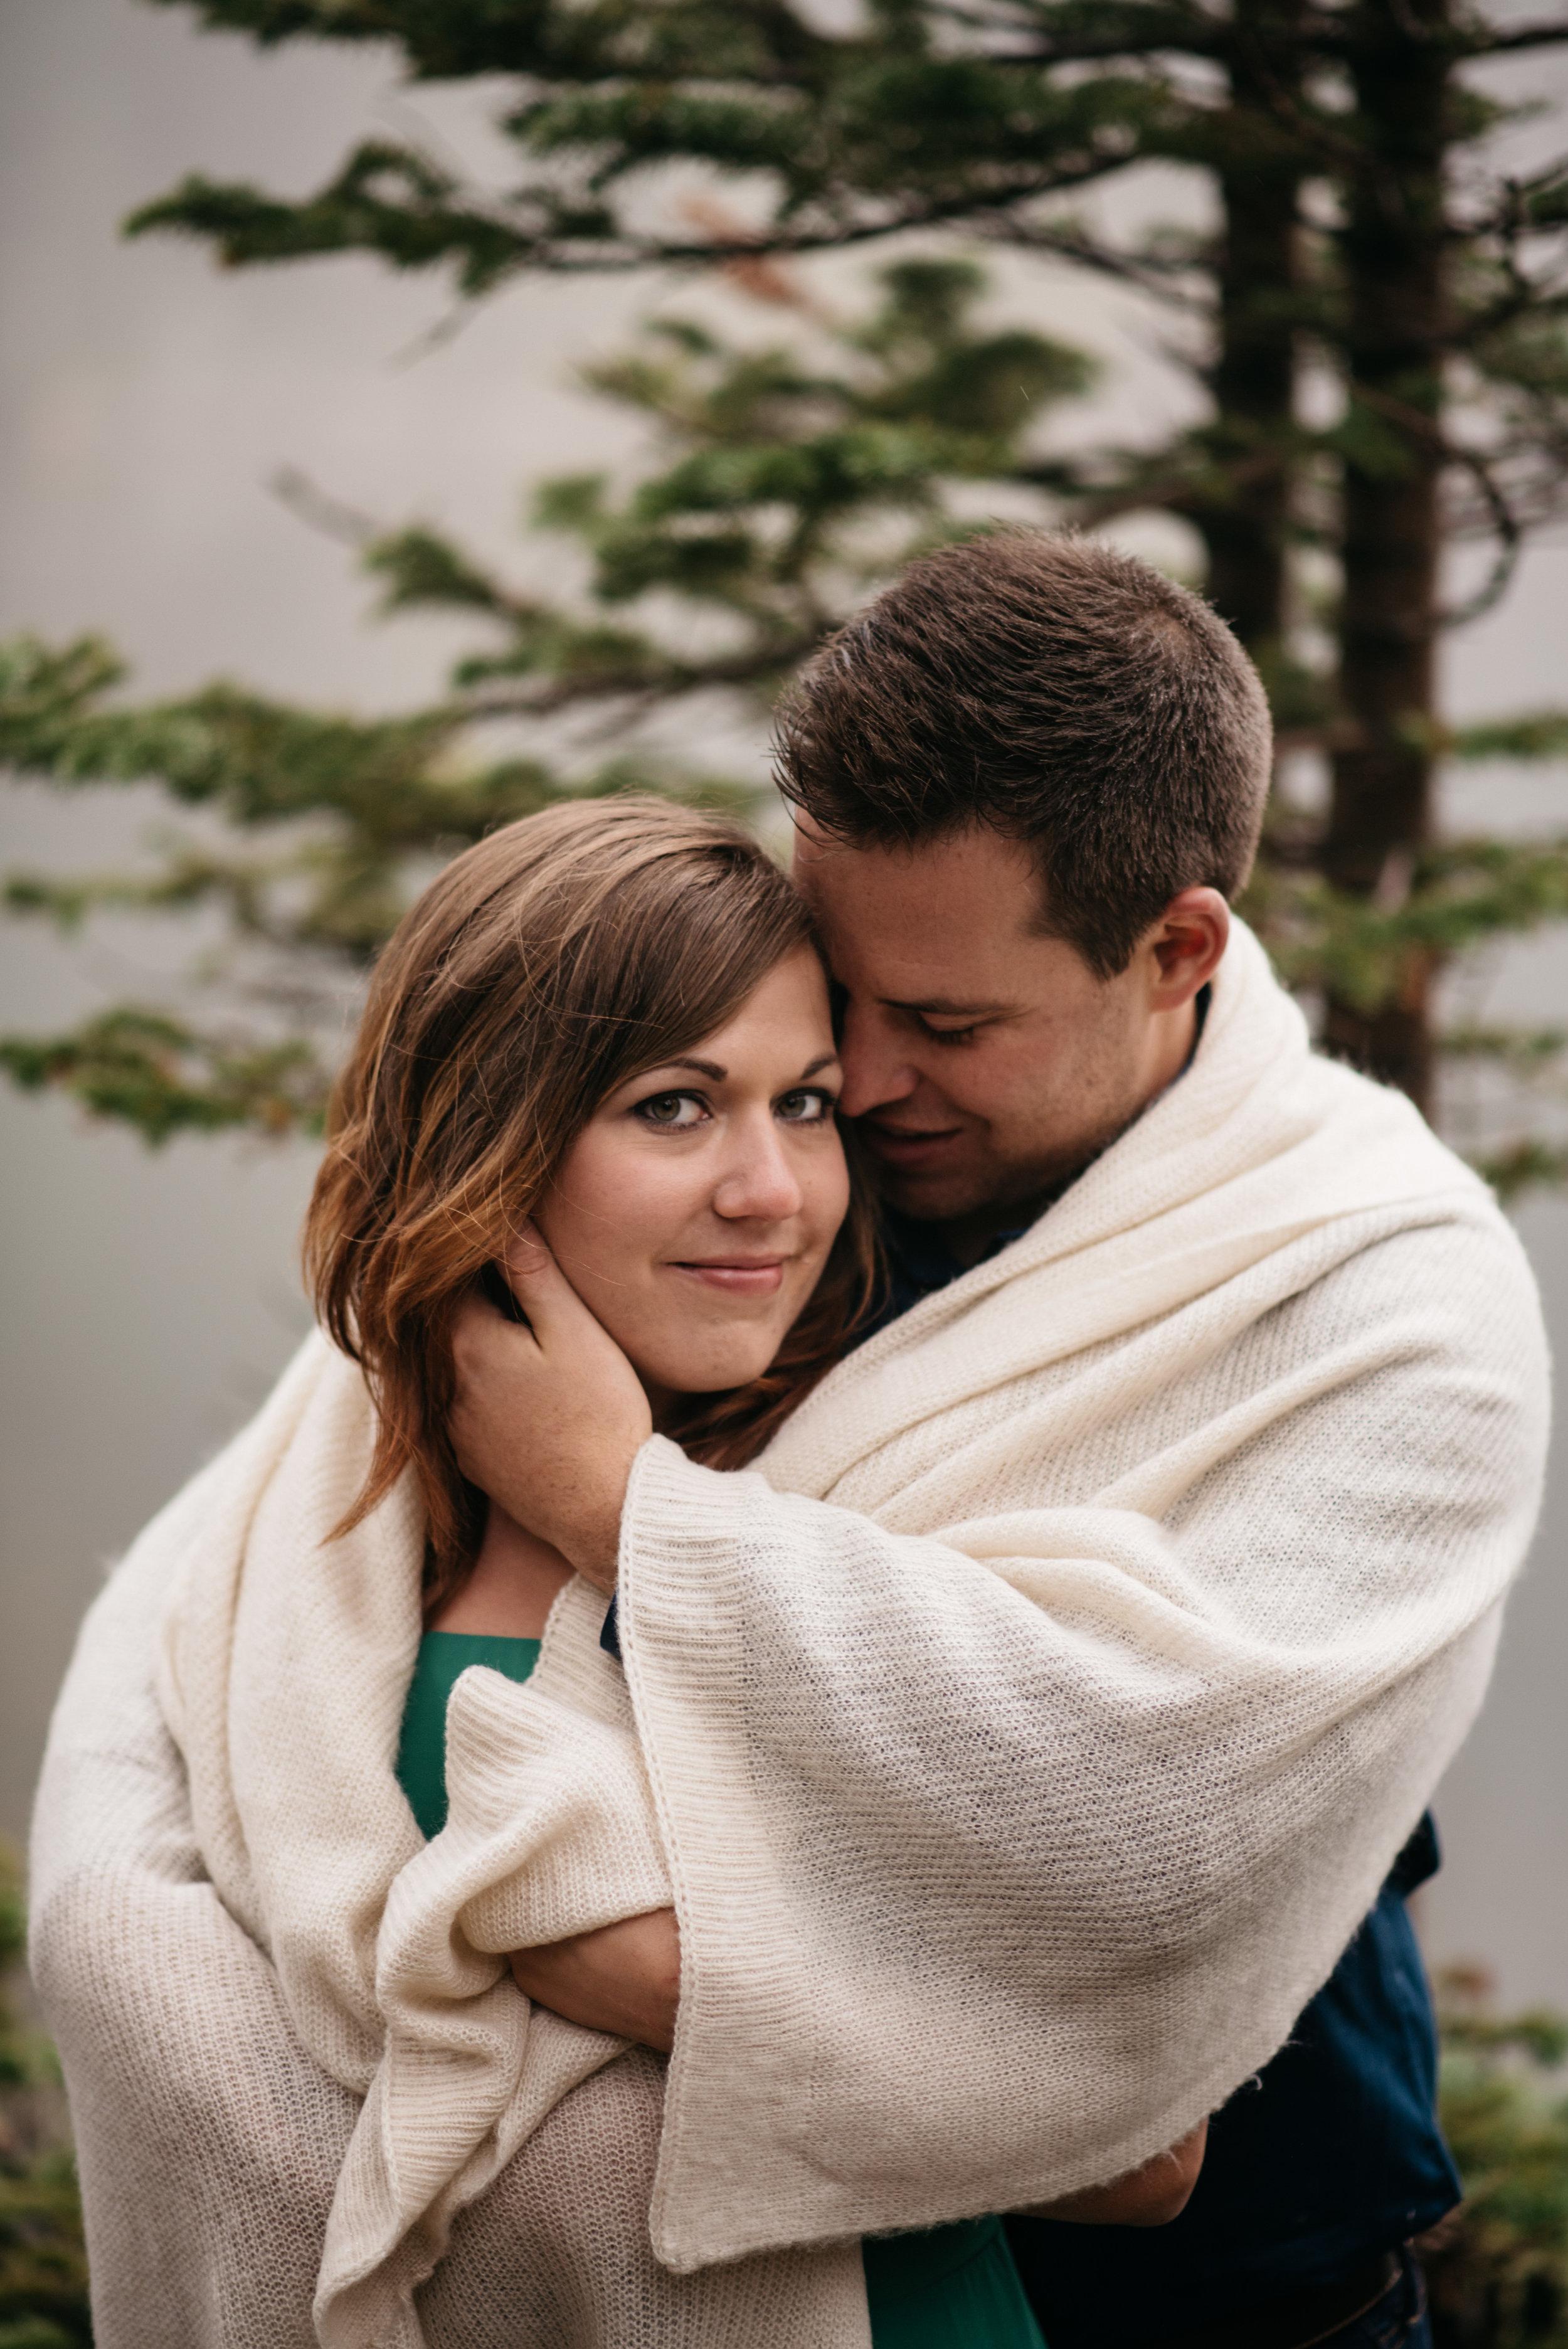 Denver, Colorado wedding photography